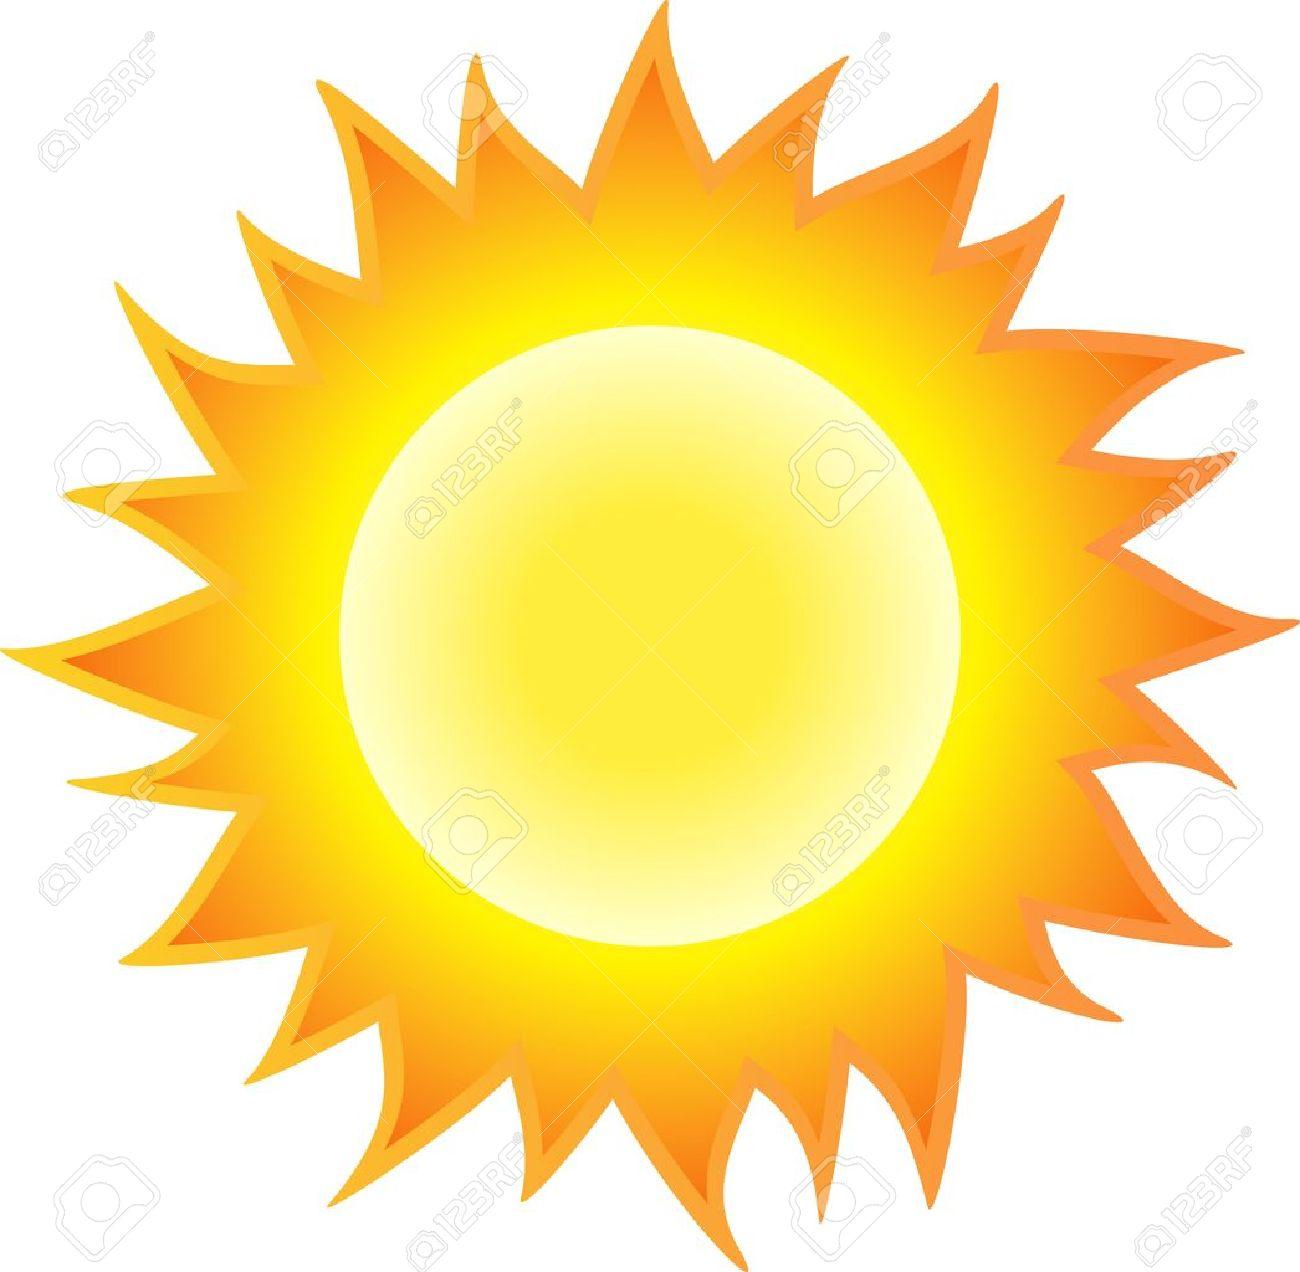 The sun burning like flame. Isolated on white background. - 14243464